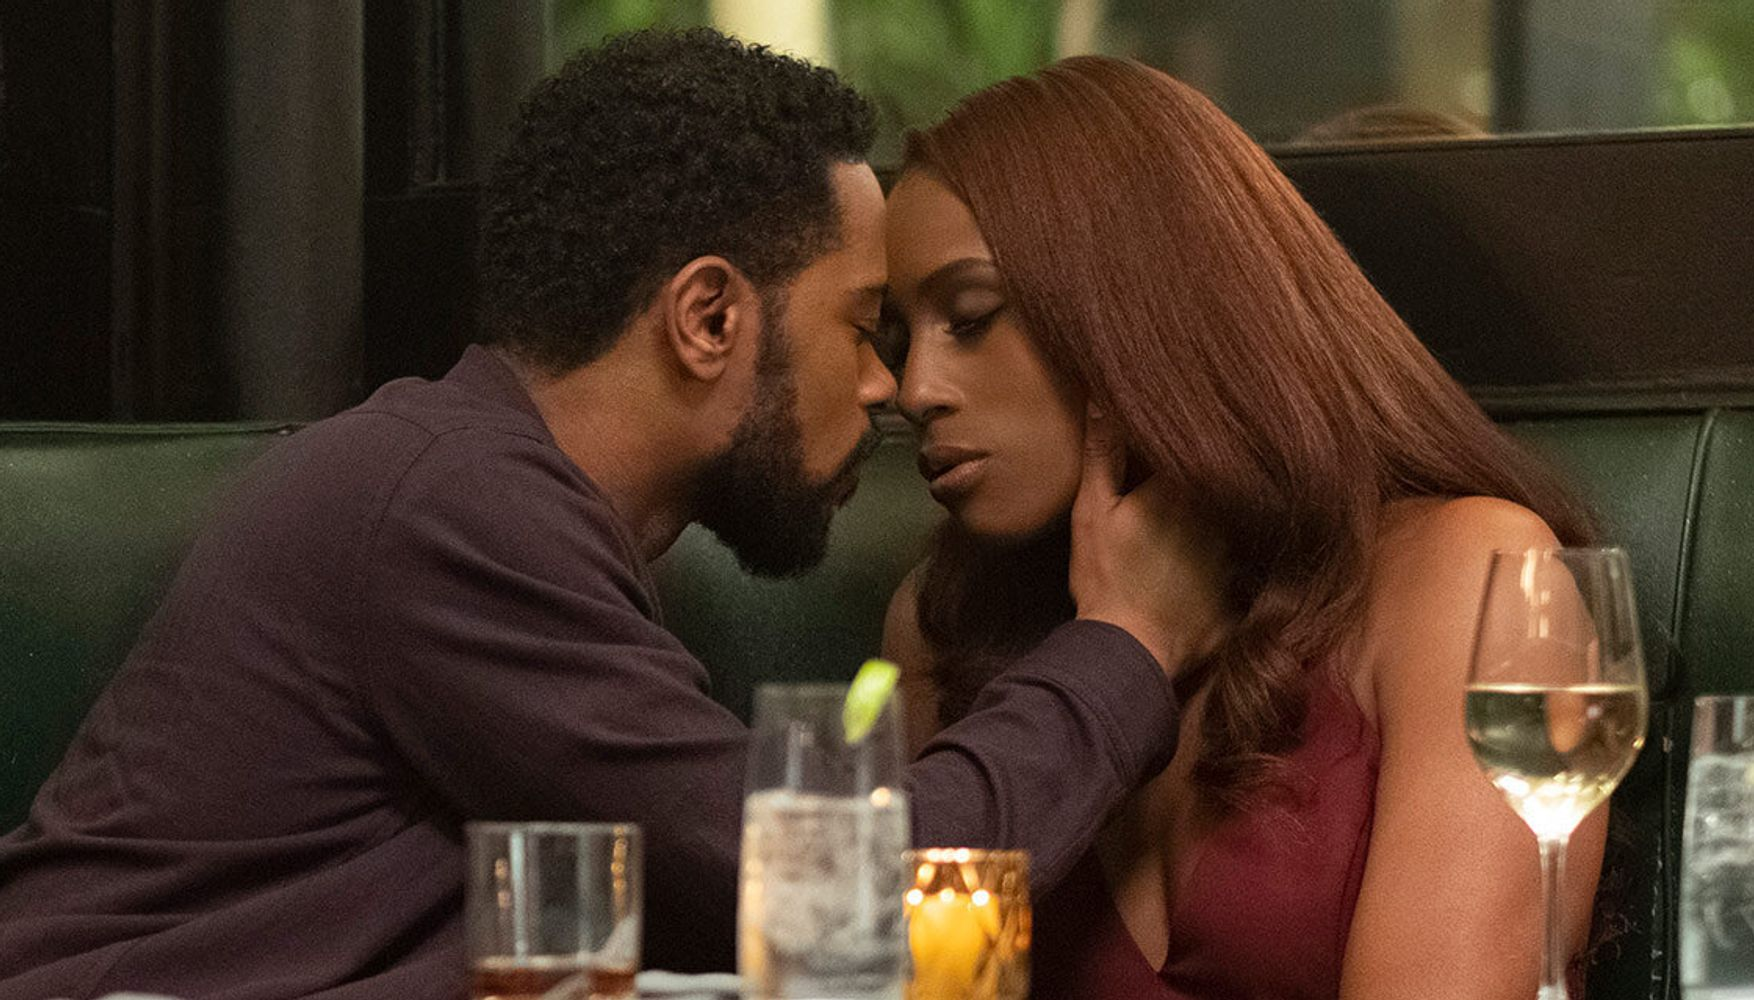 """The Photograph"" Makes A Case For More Black Romantic Dramas"